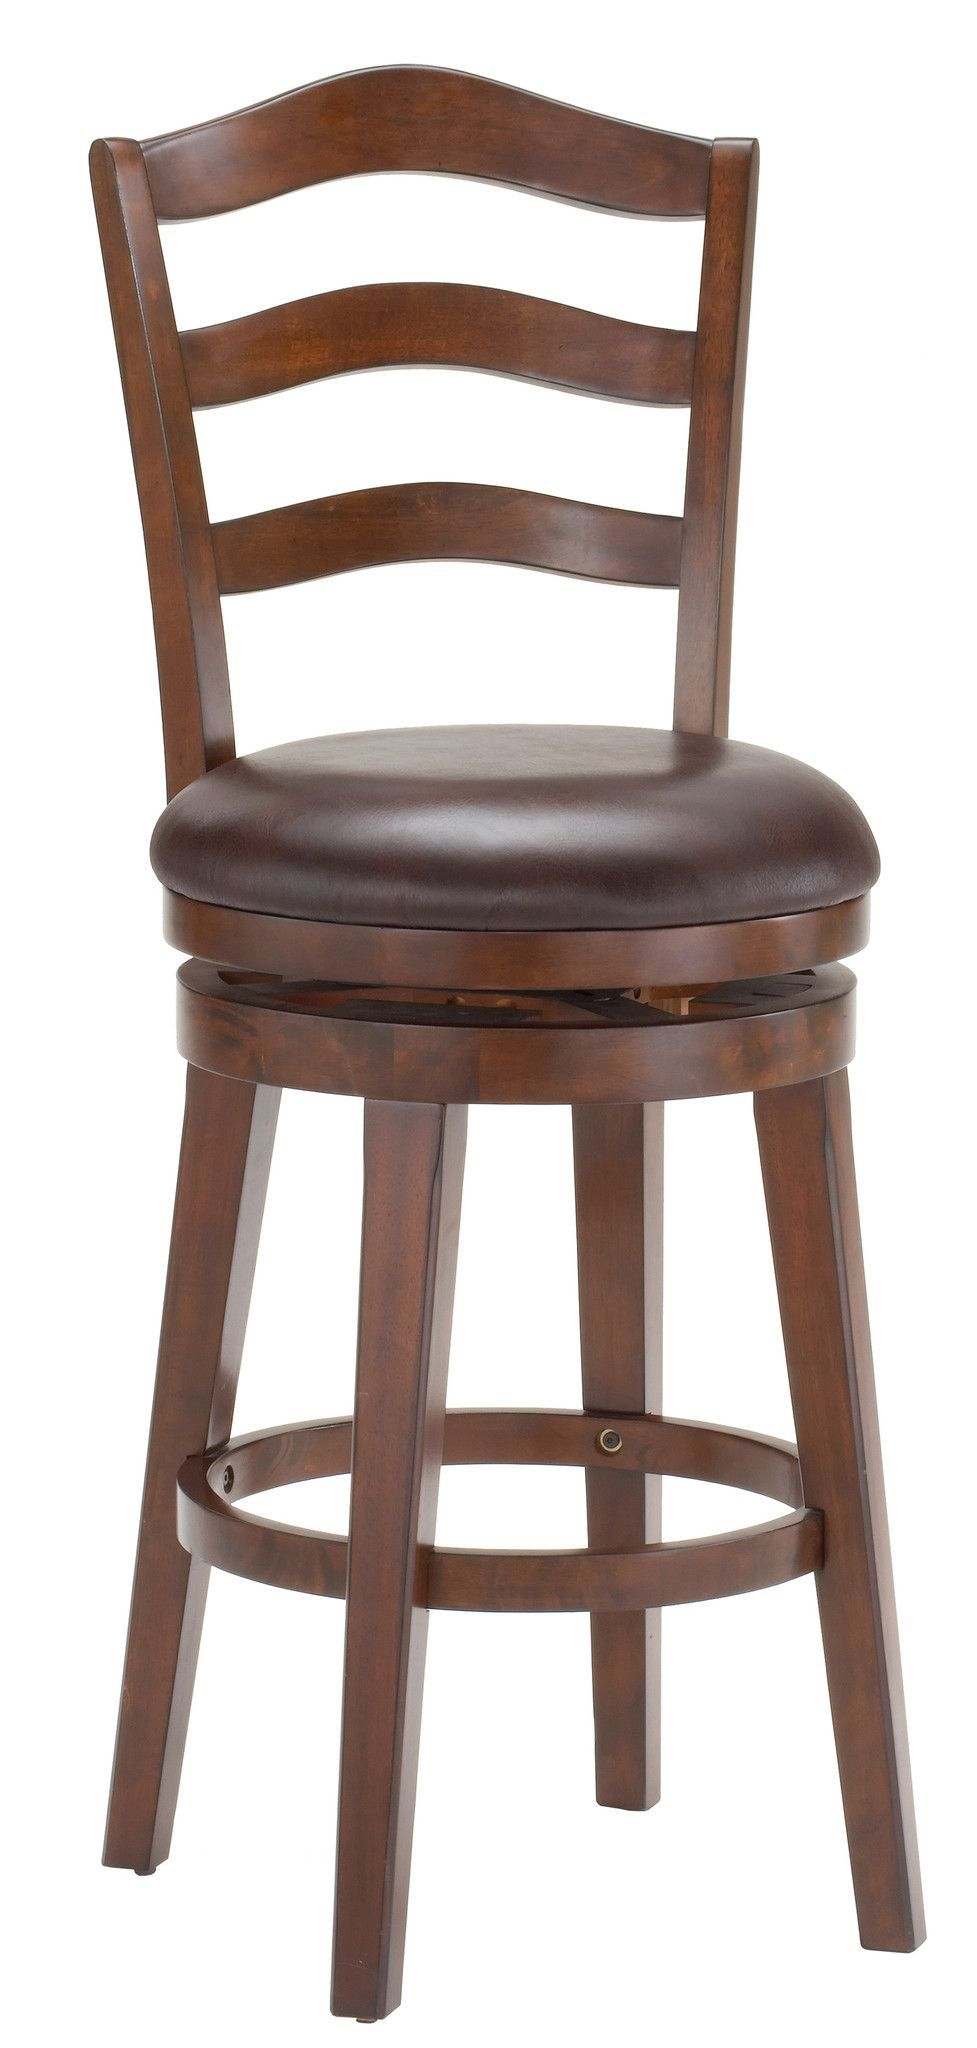 Hillsdale Windsor Swivel Bar Stool | Products | Pinterest